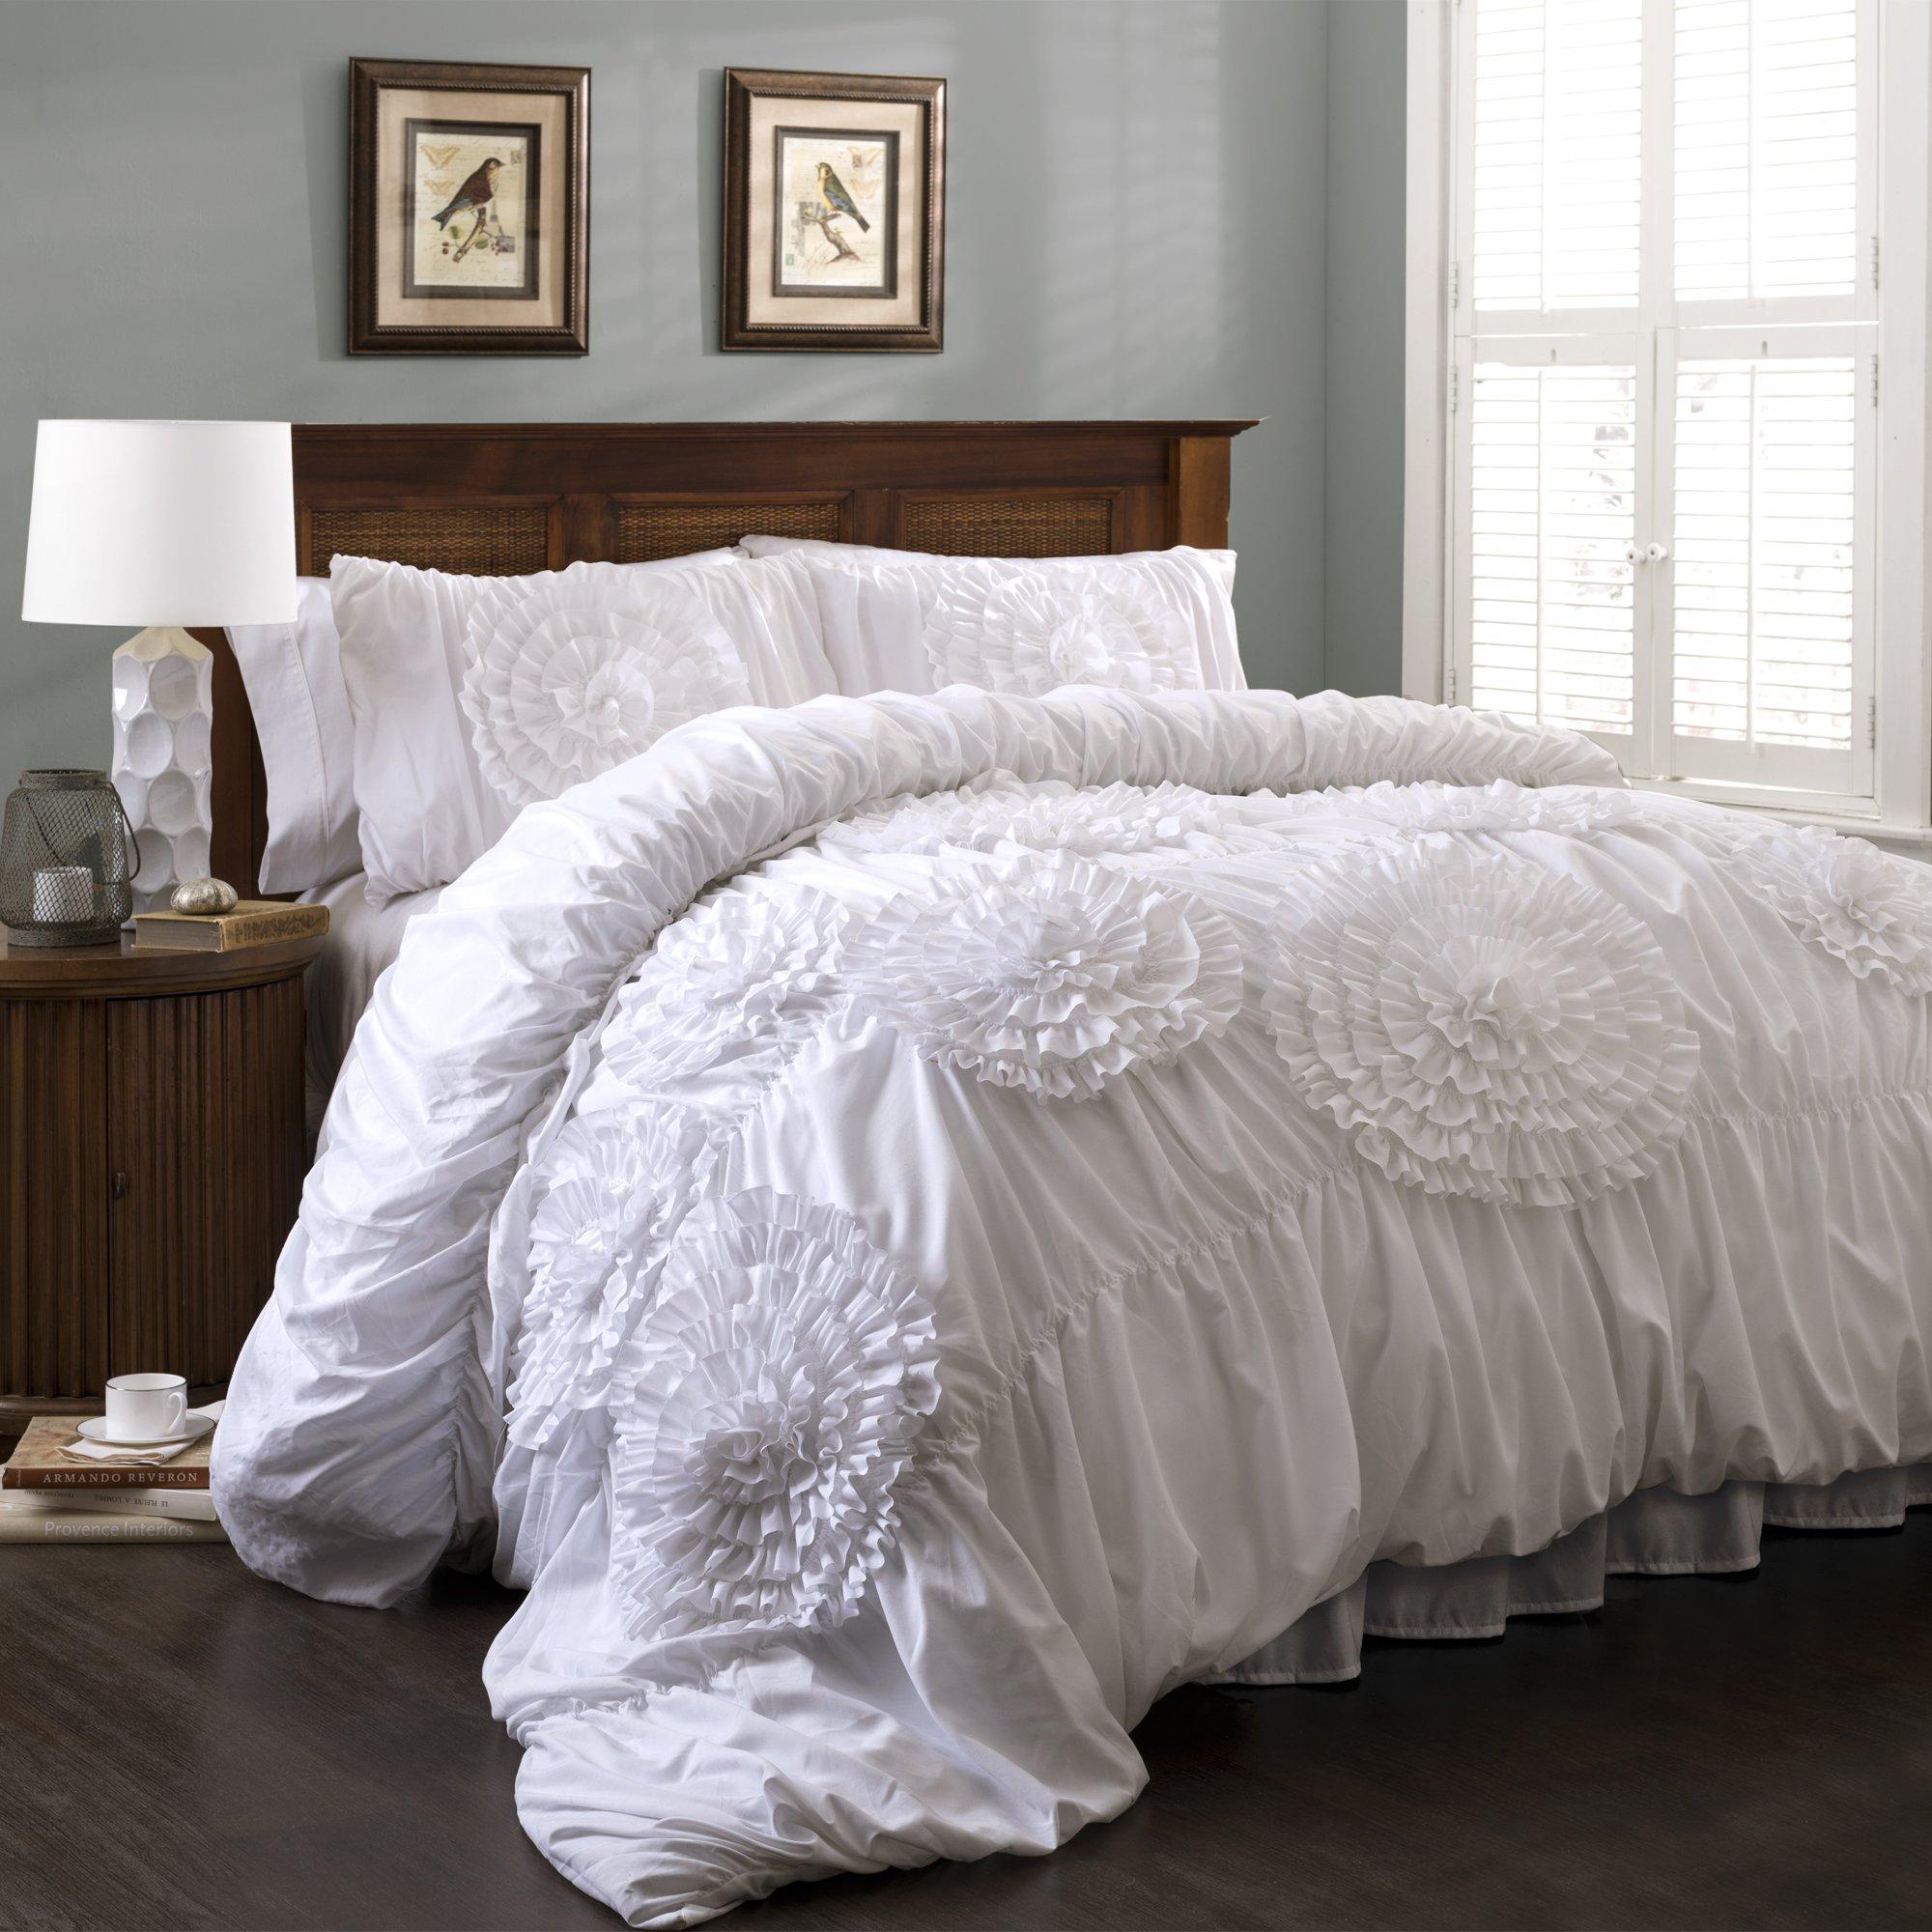 Lush Decor 3 Piece Serena Comforter Set, King, White